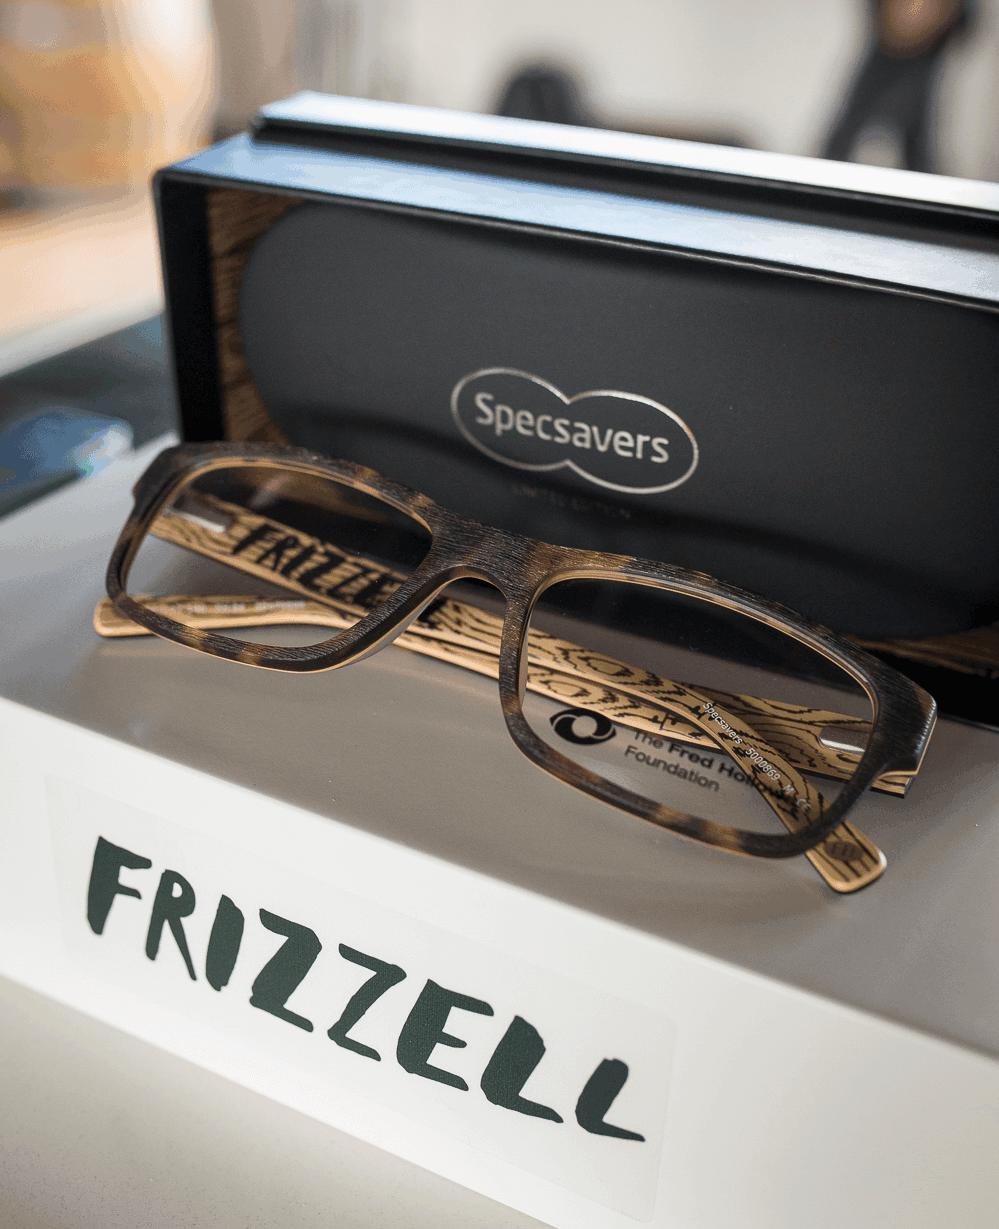 Frizzel frames glasses package